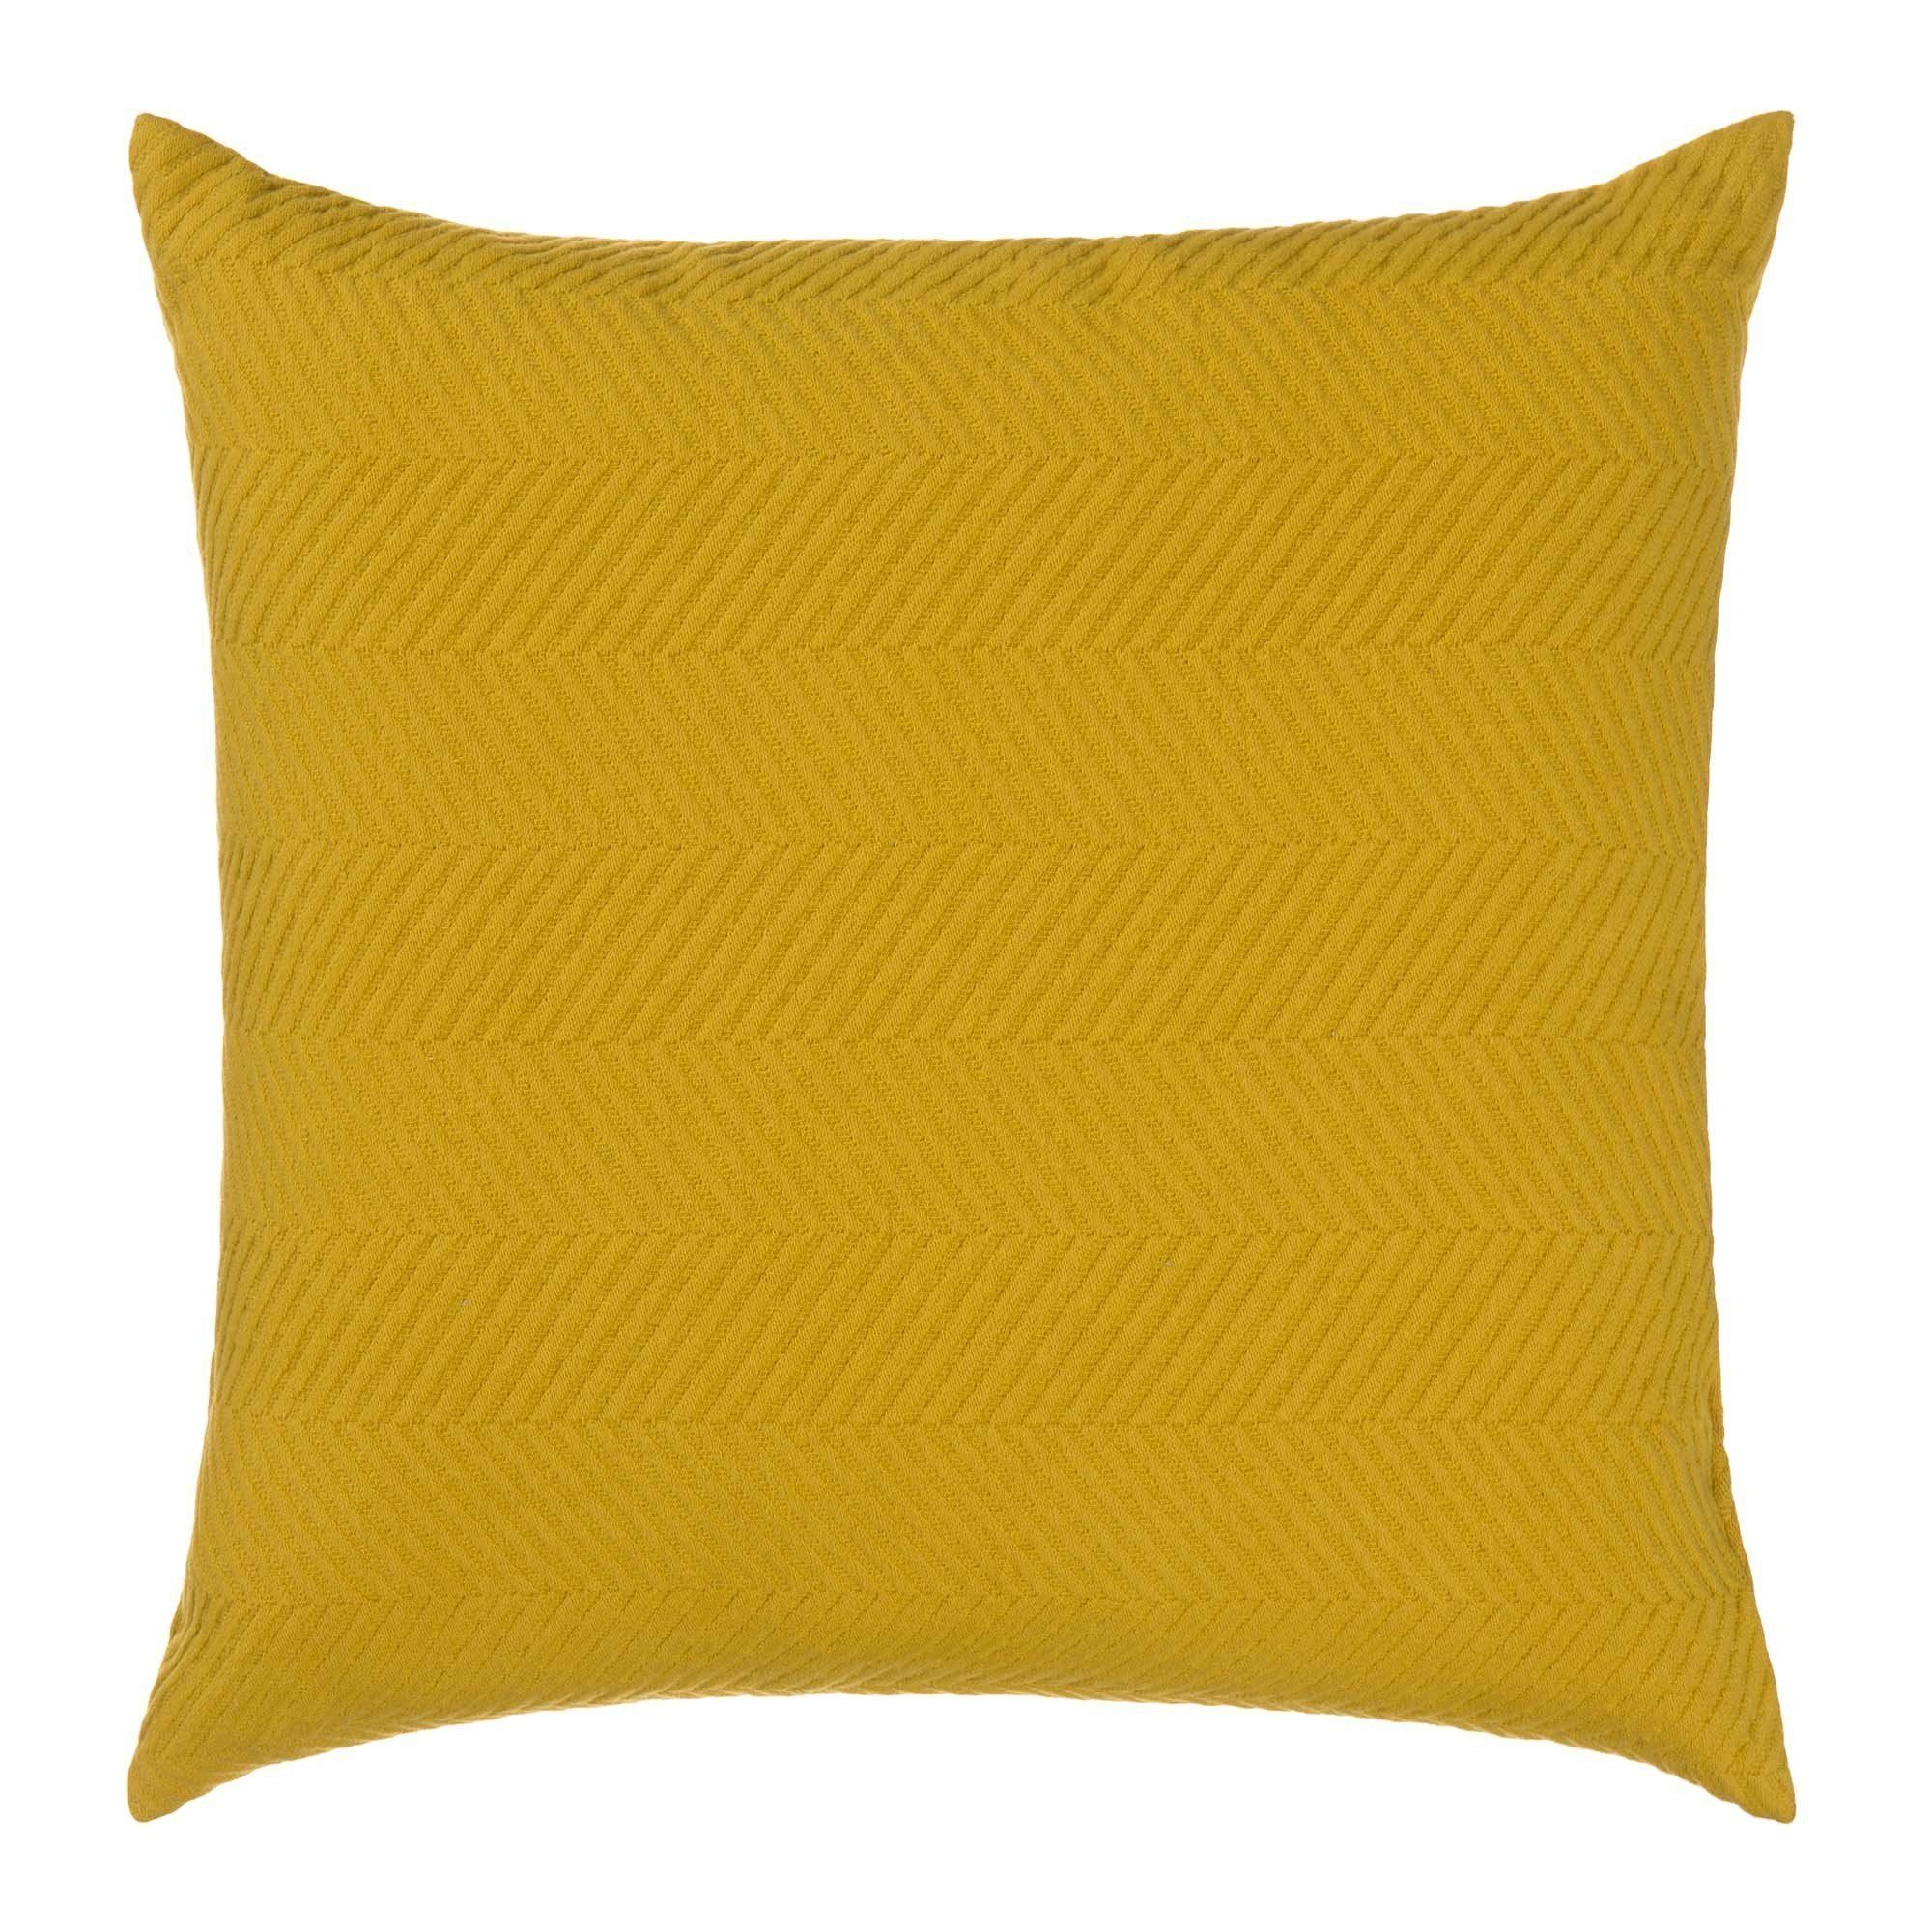 Tagesdecke Lixa Senfgelb 275x265 Cm Senfgelb Kissen Gelb Und Tagesdecke